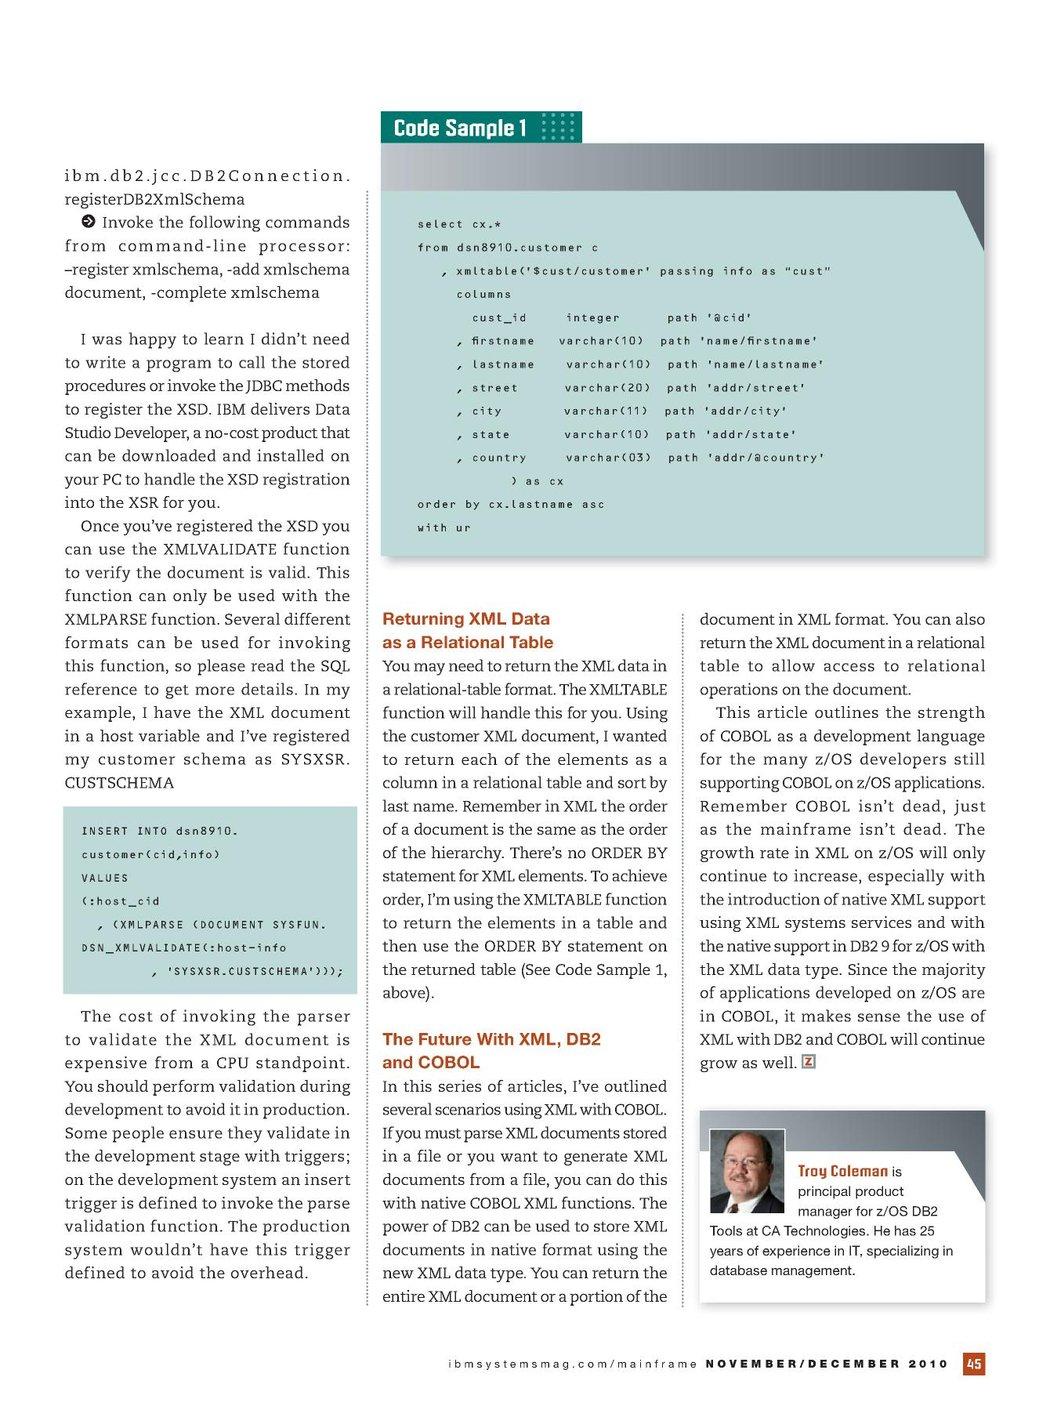 IBM Systems Magazine, Mainframe Edition - November/December 2010